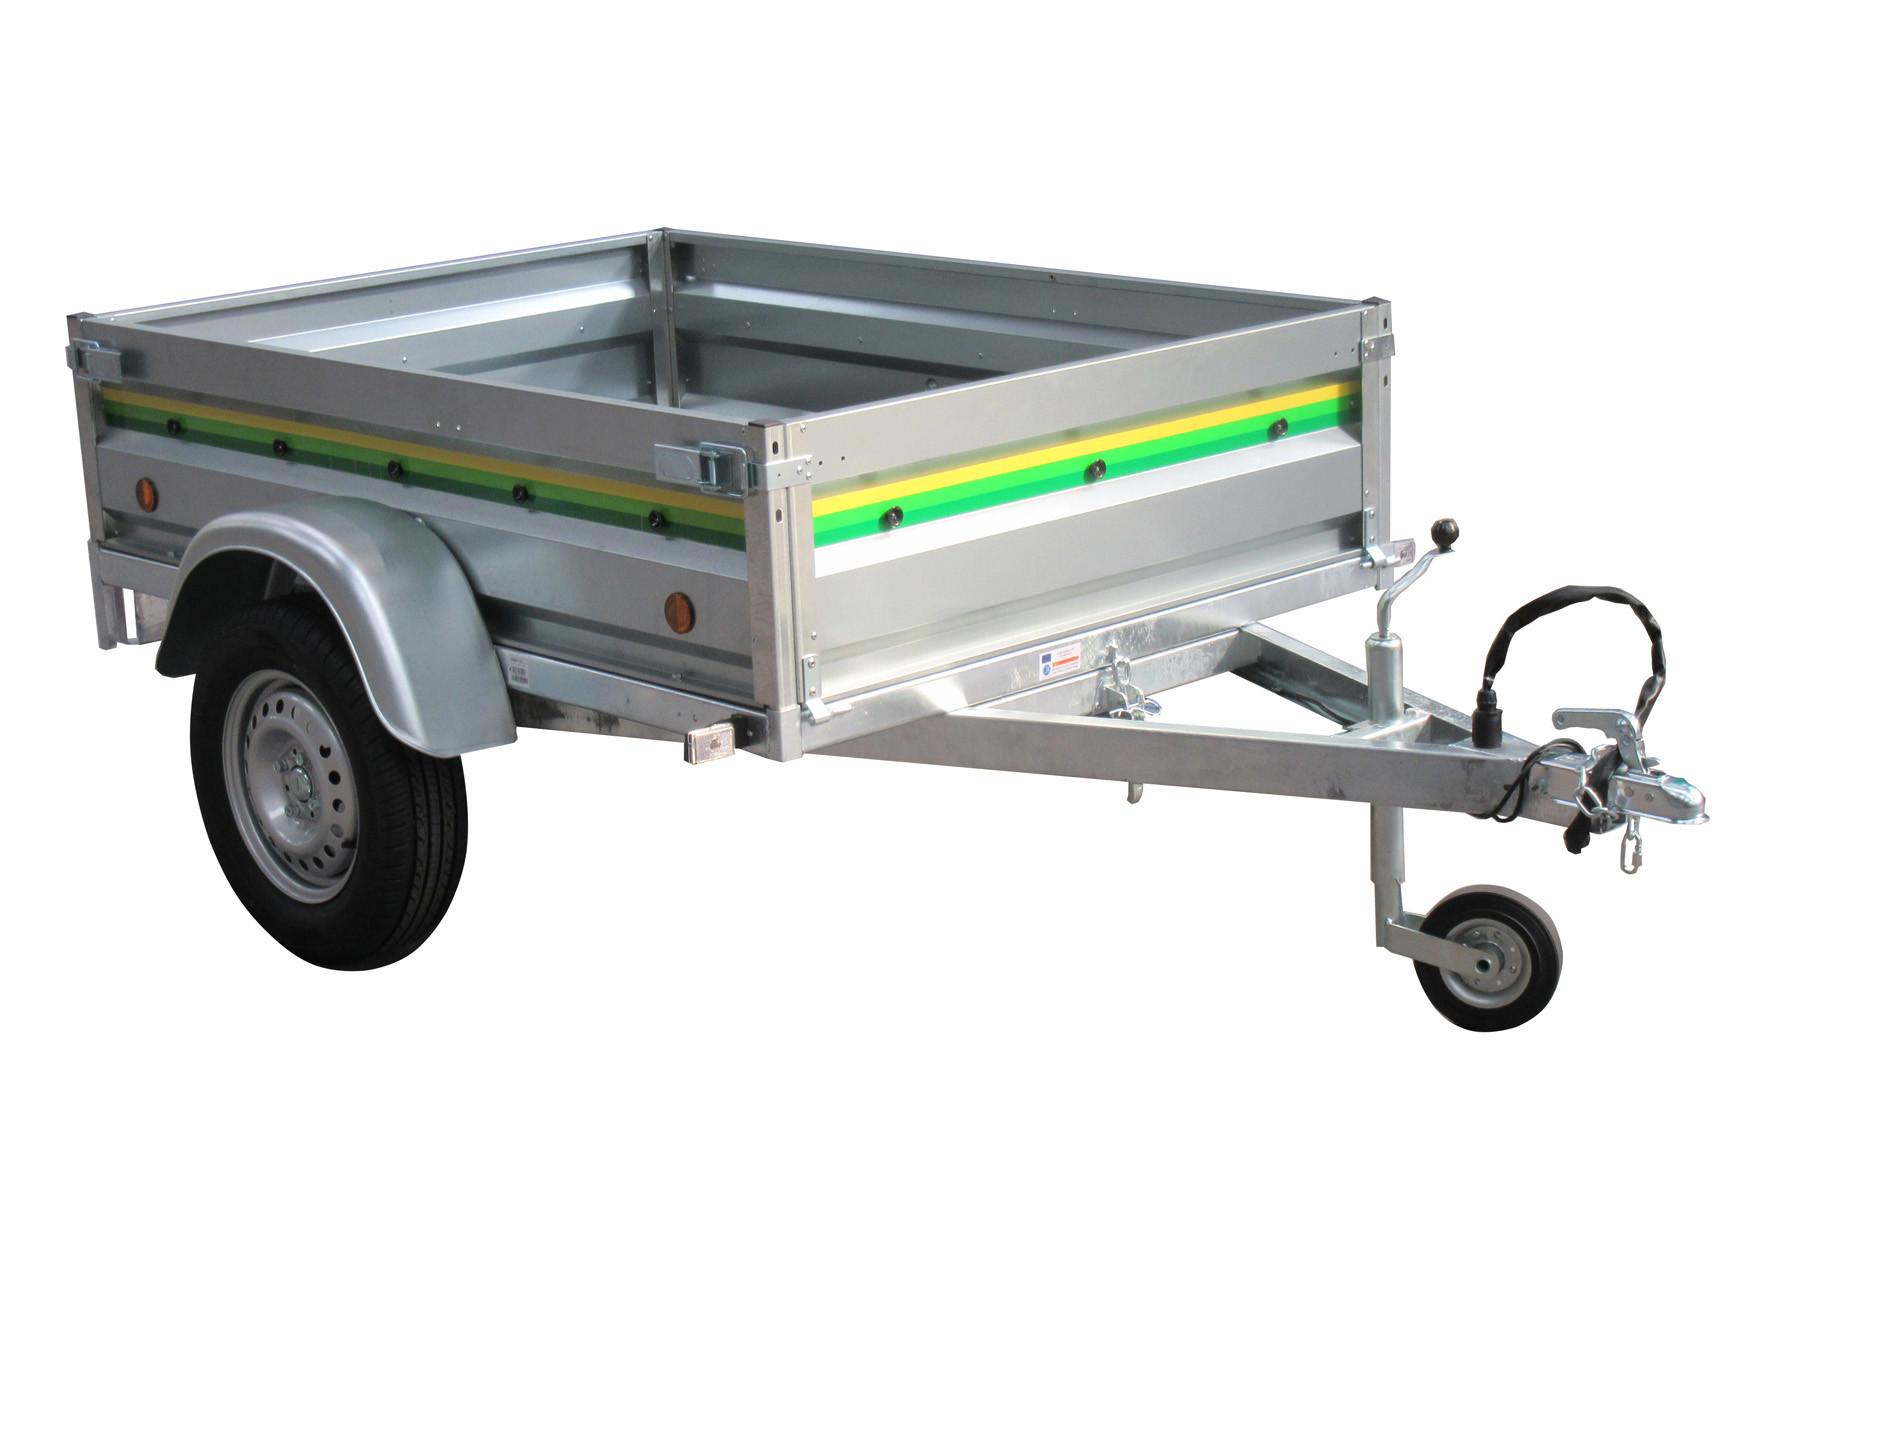 Remorque basculante 1,70m 500kg ESPACE EMERAUDE OPALE 17